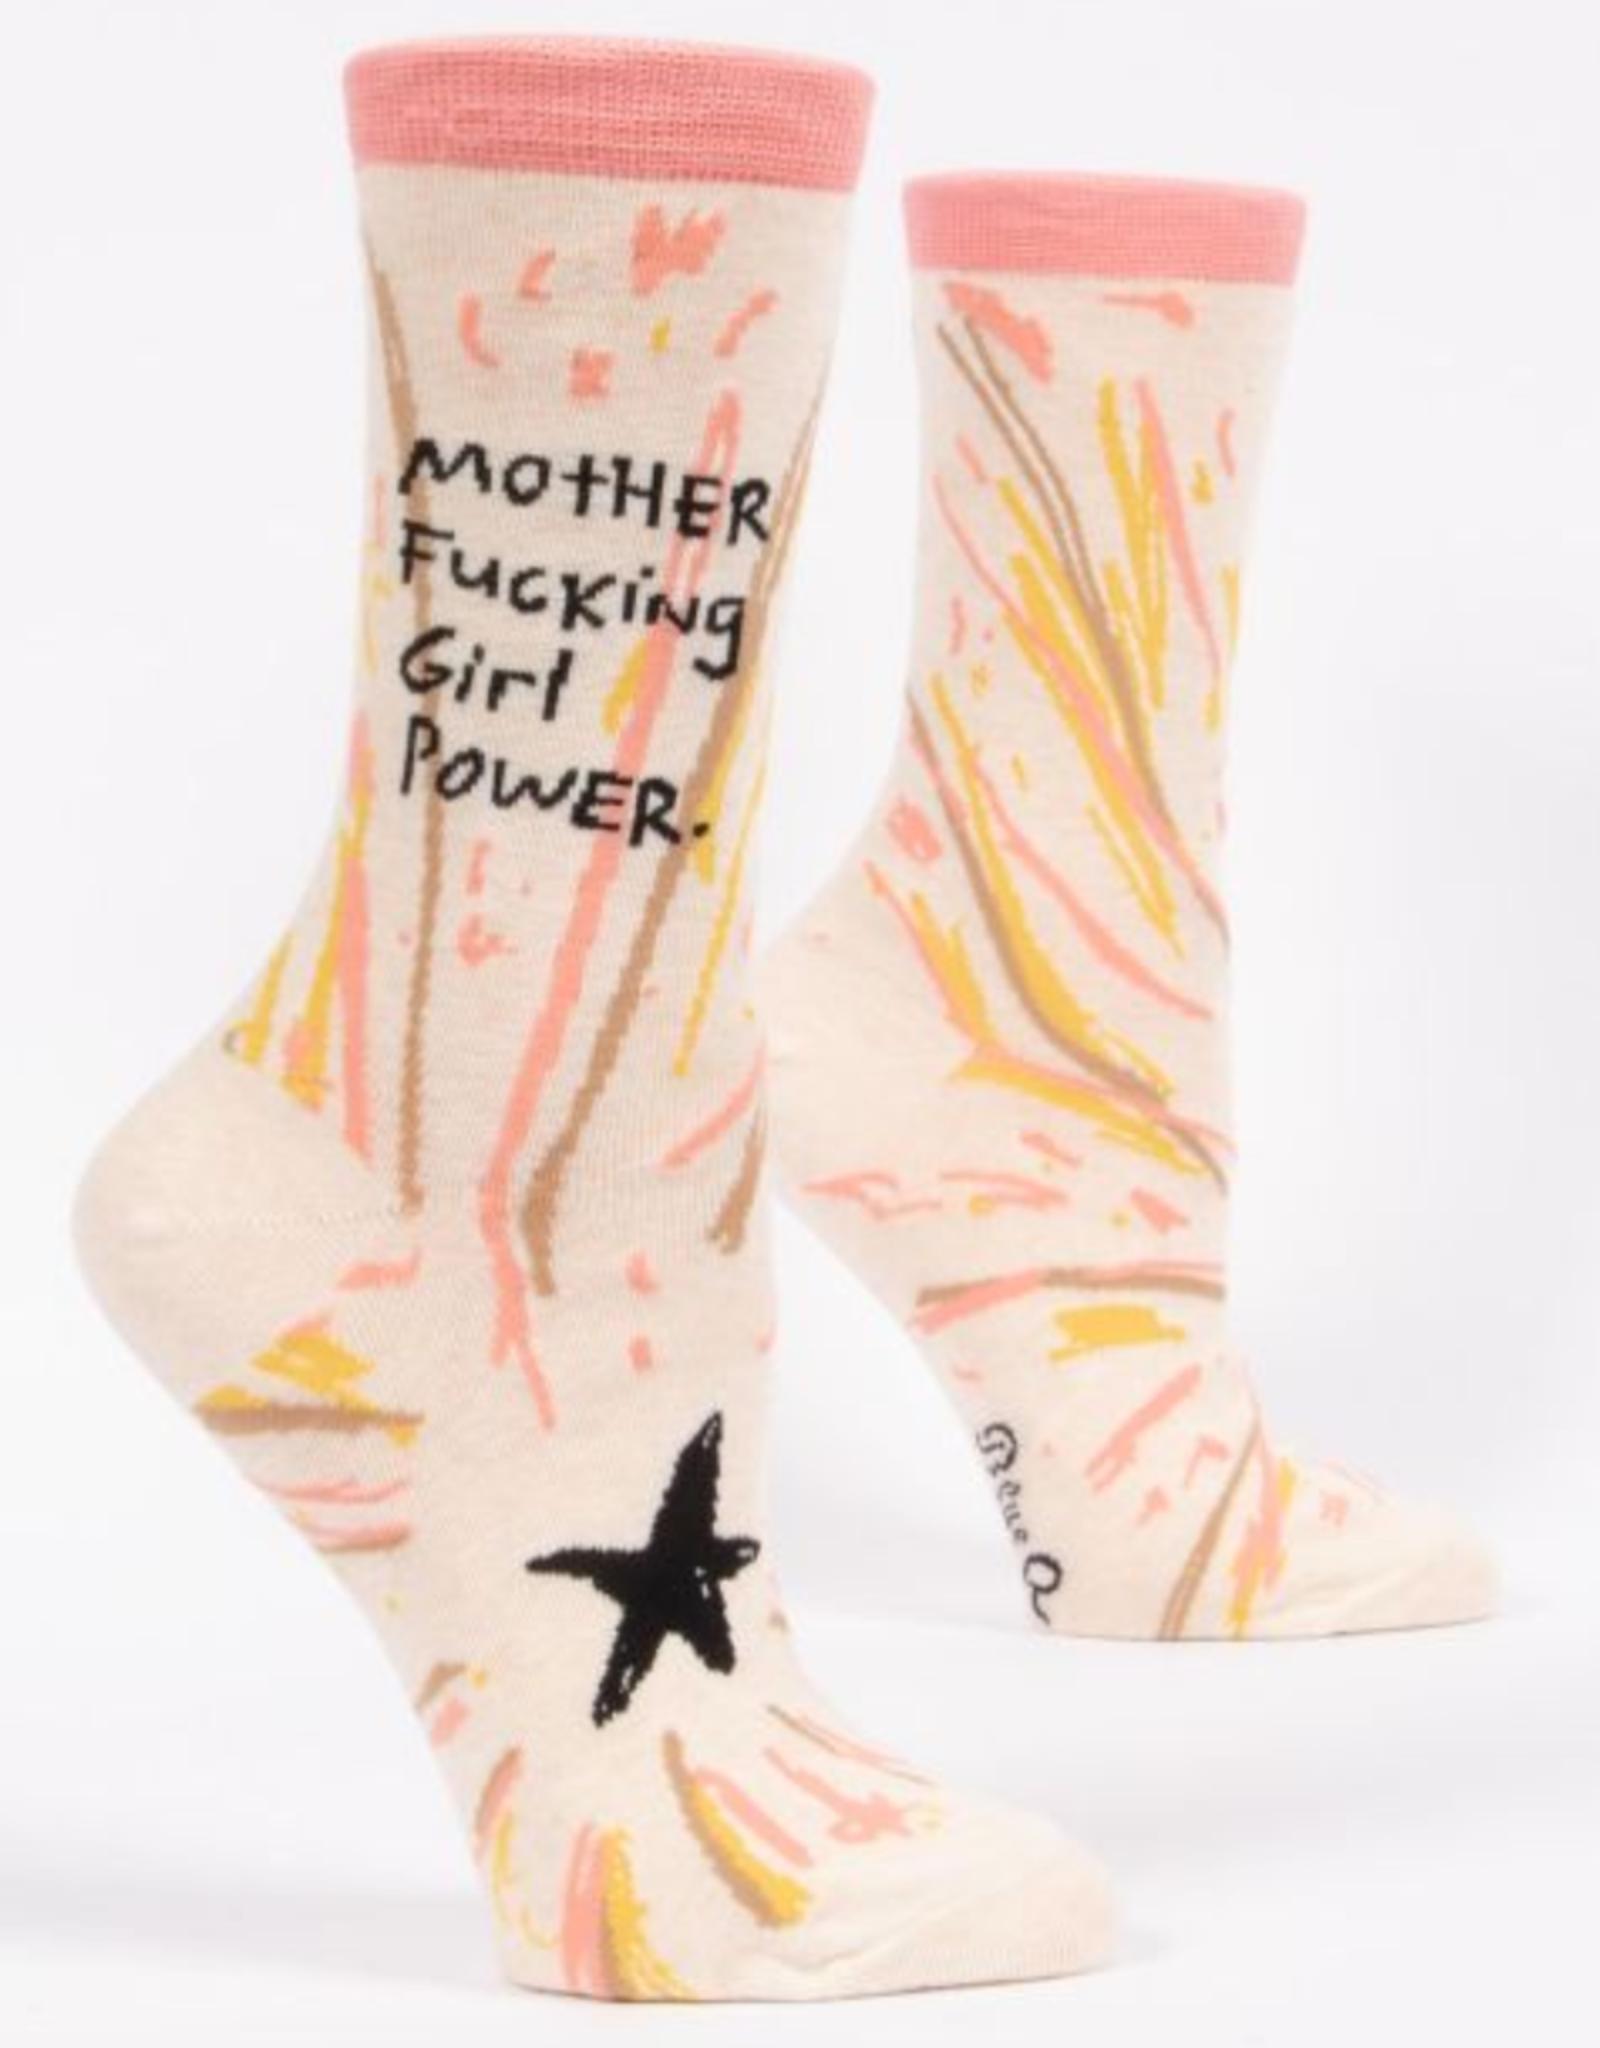 *explicit* Blue Q Womens Crew Socks Mother Fucking Girl Power